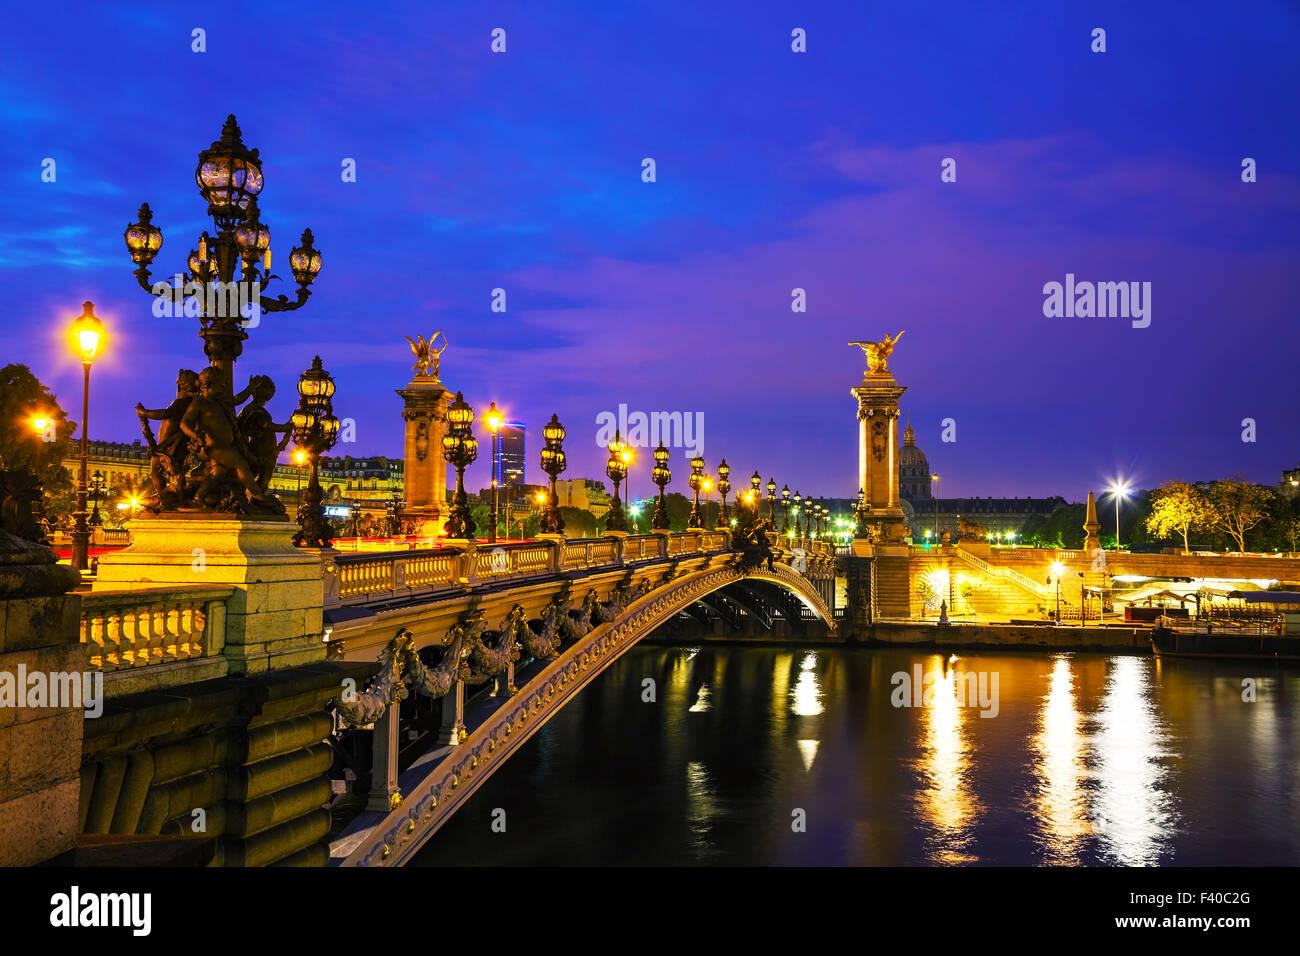 Aleksander III bridge in Paris - Stock Image